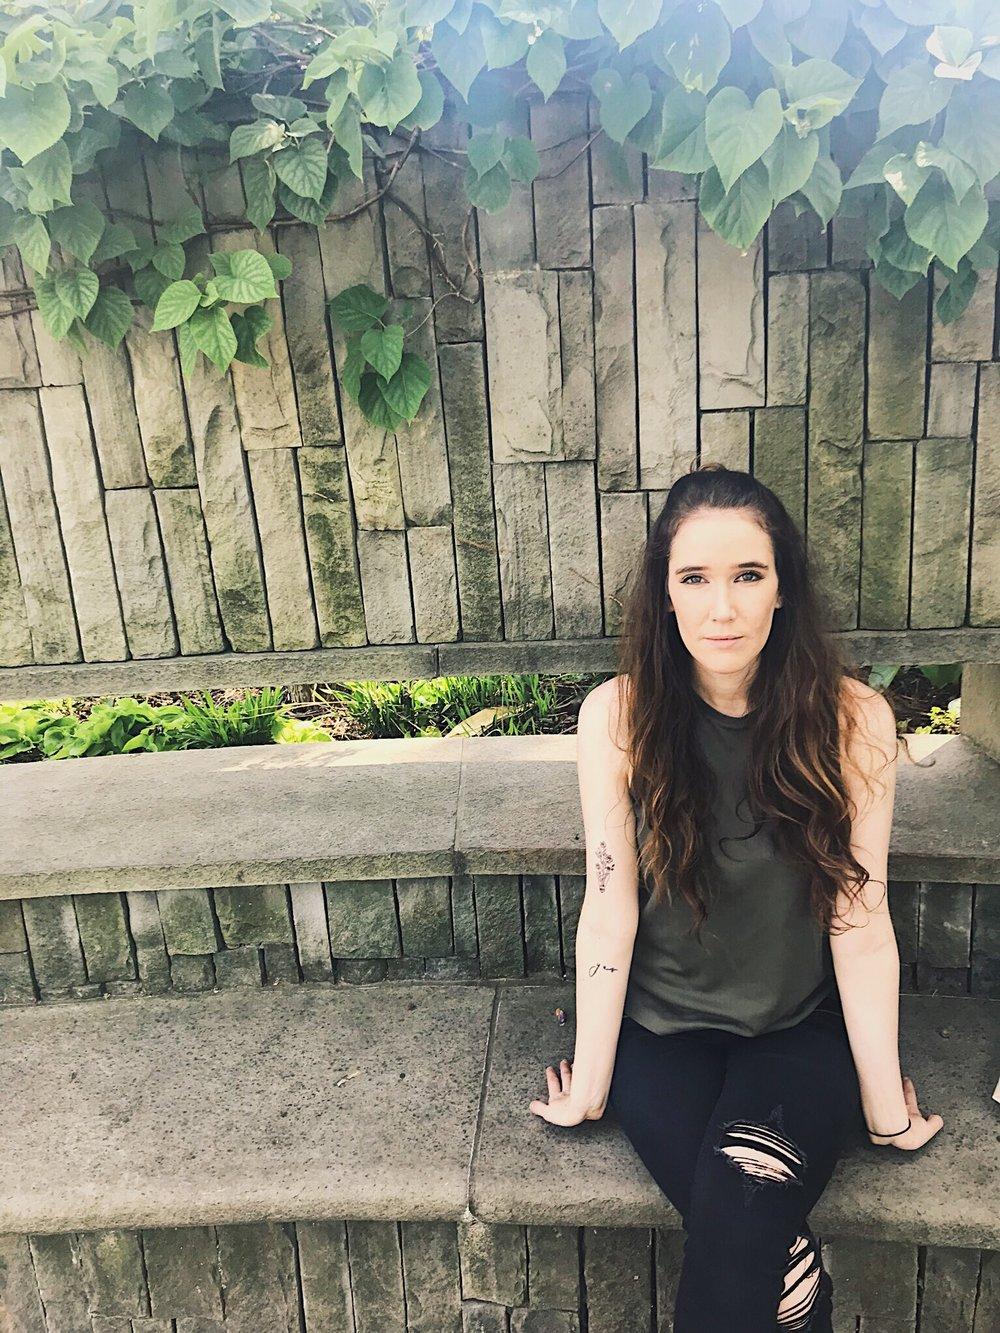 ADRIENNE WRITES STUFF - Adrienne's music is